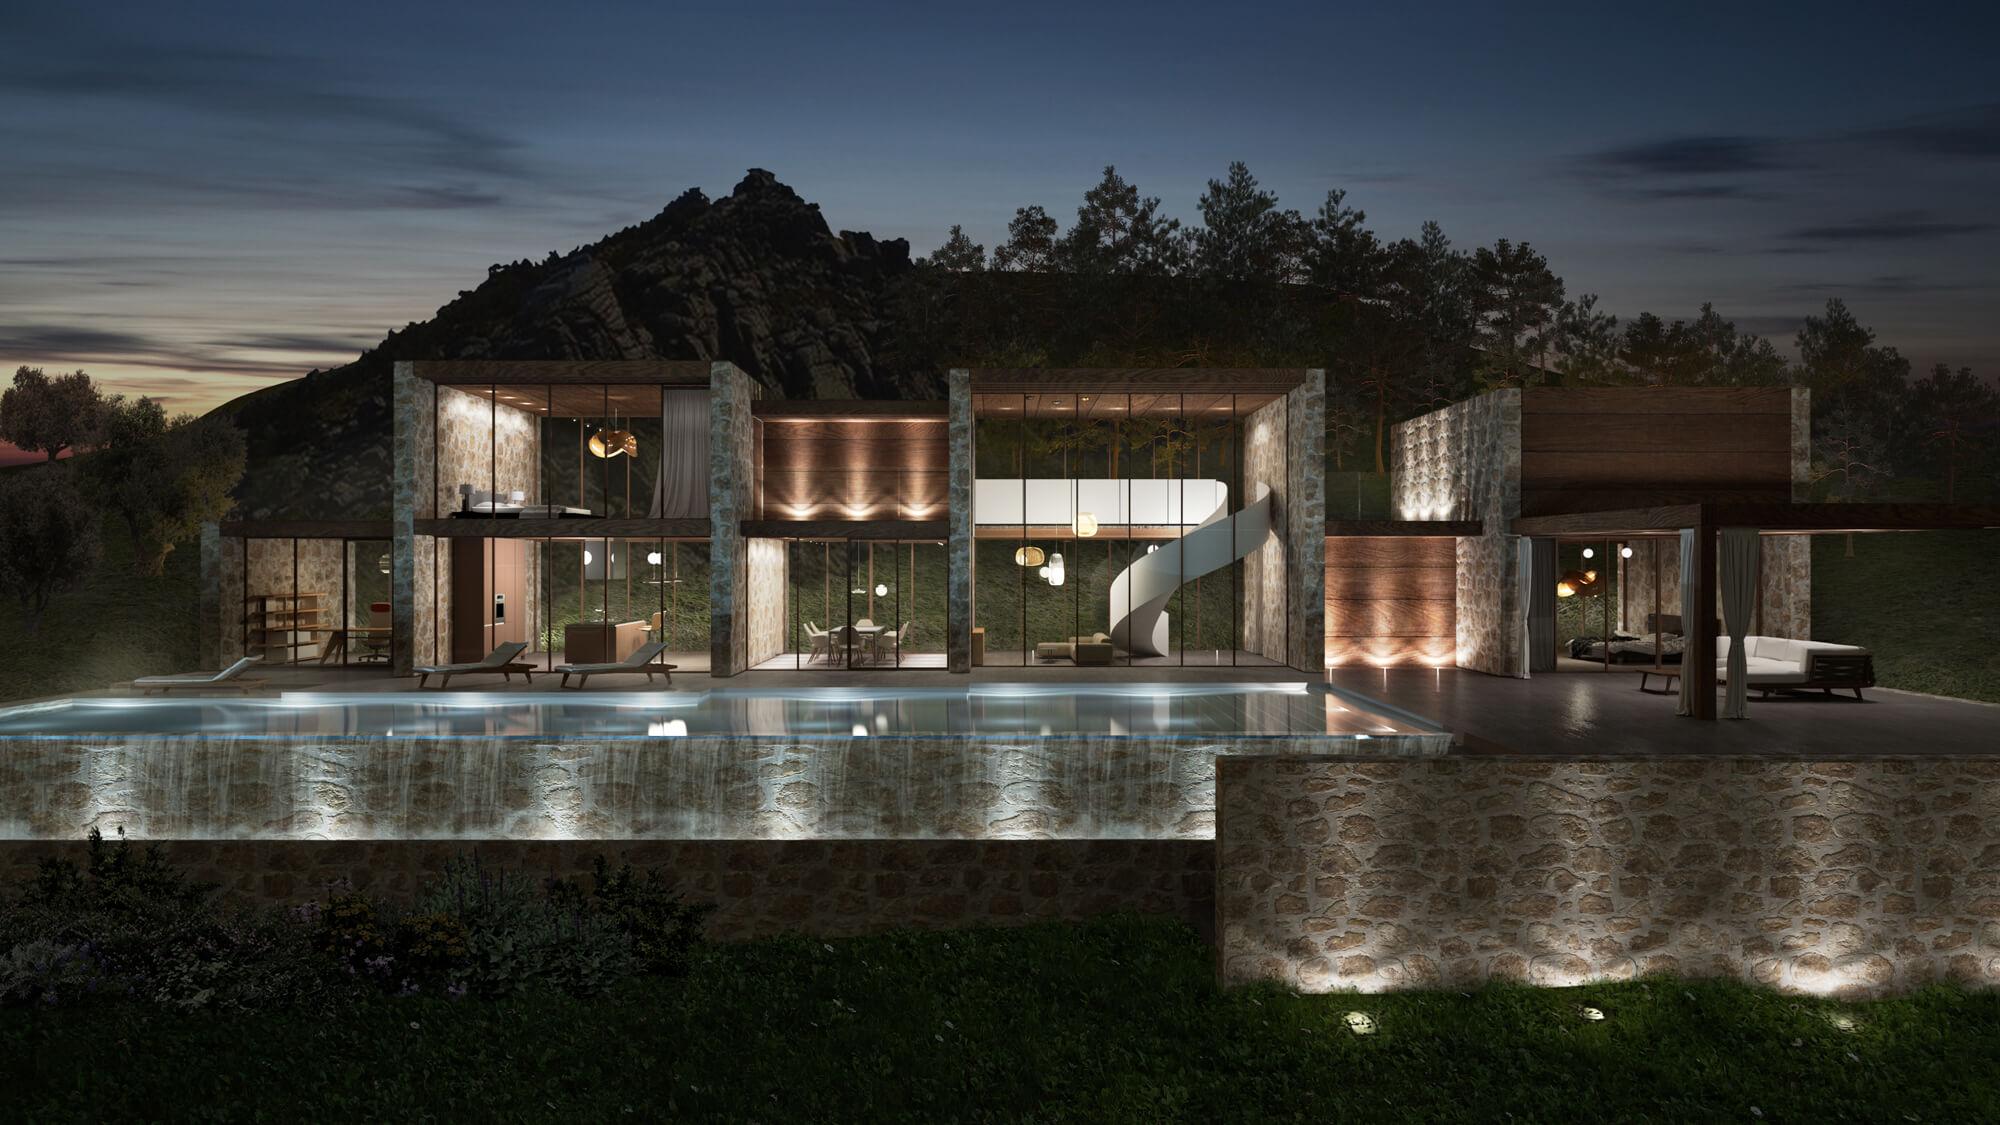 dream_house_night